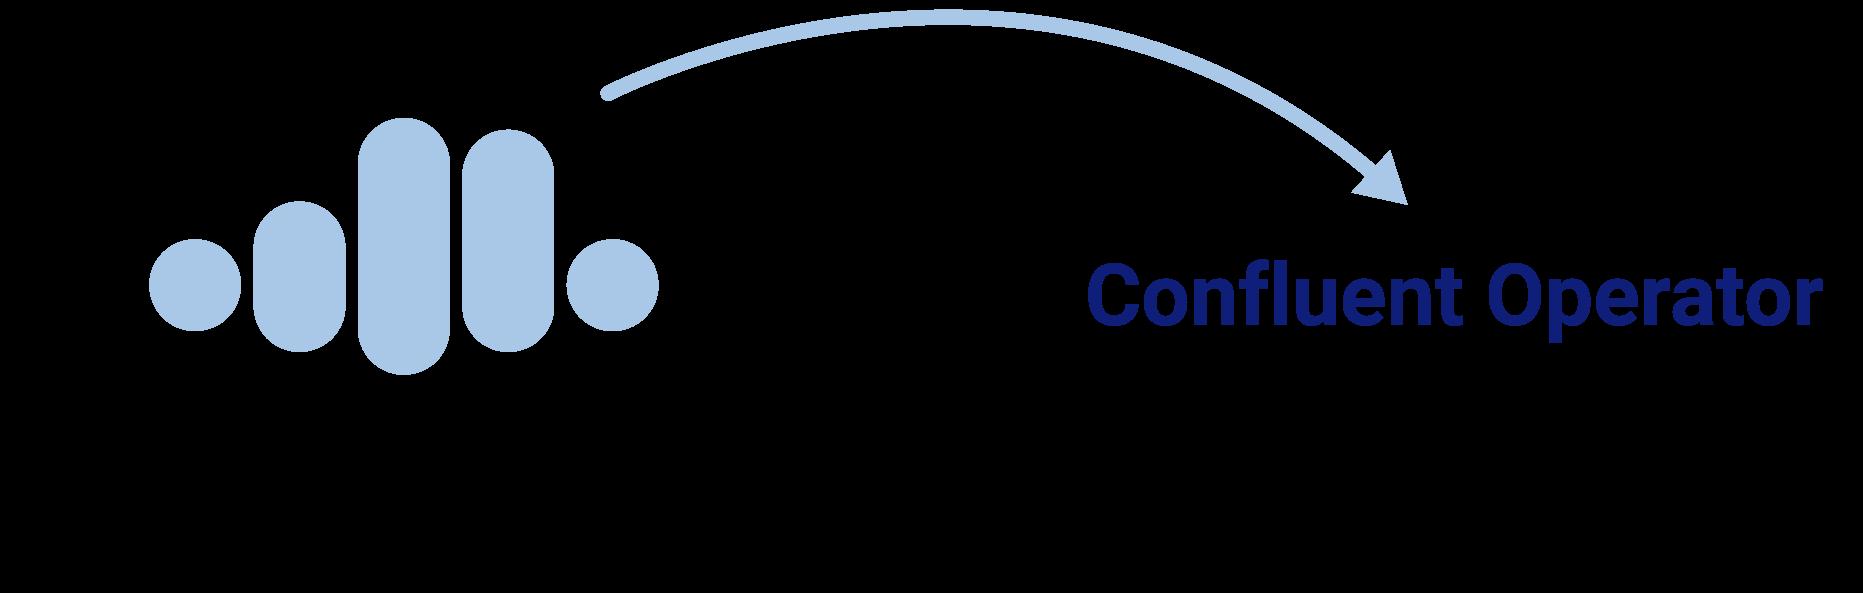 Confluent Operator | Automate Apache Kafka on Kubernetes